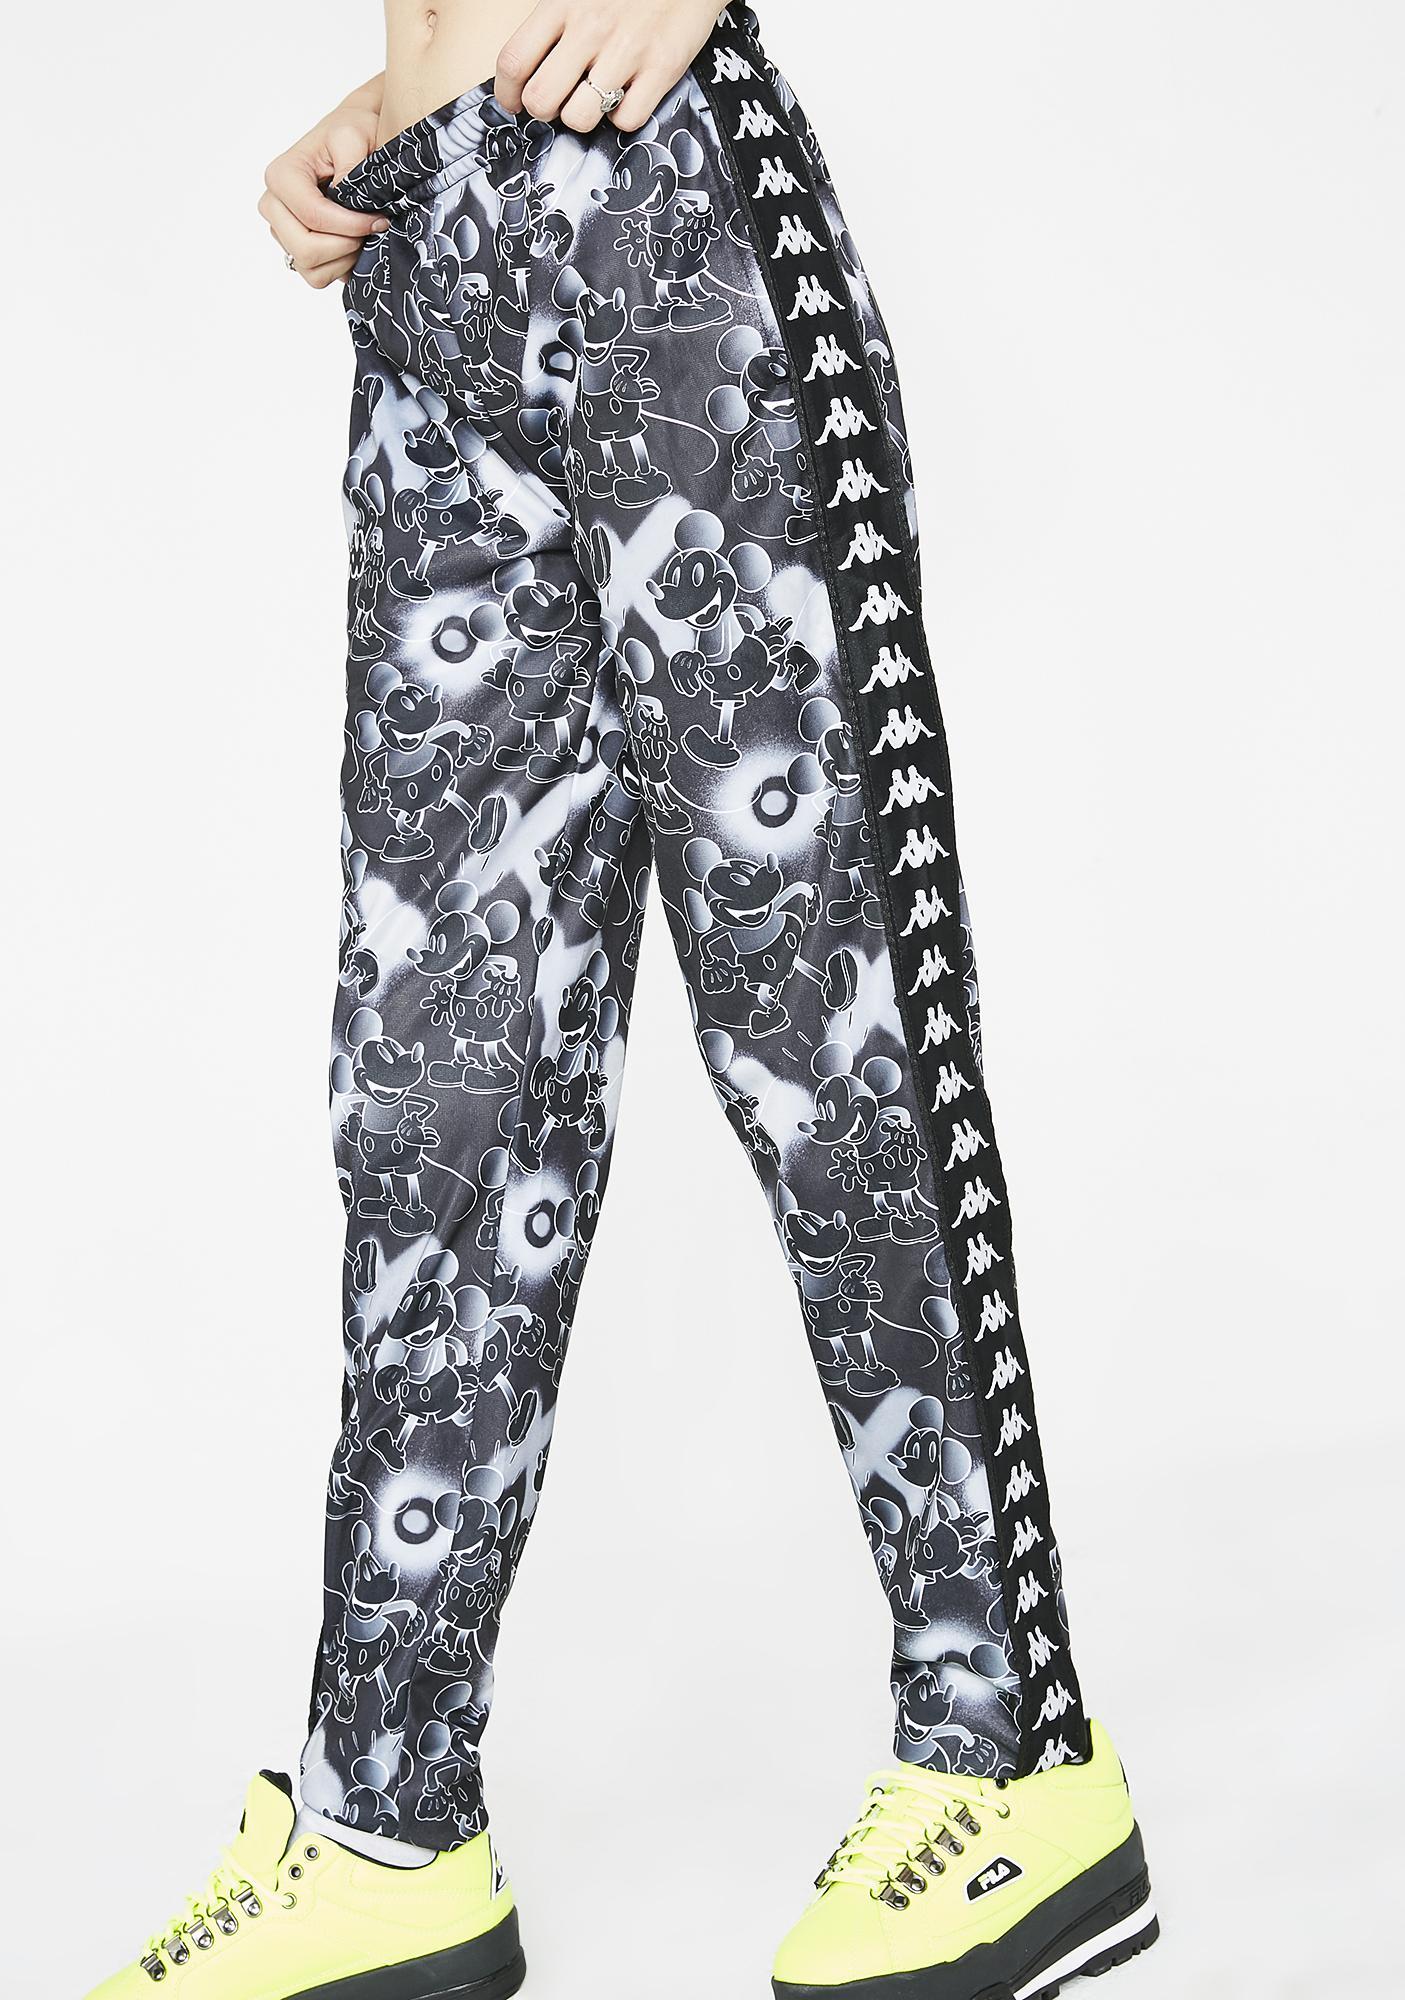 Kappa 222 Banda Astoria Disney Graphic Track Pants